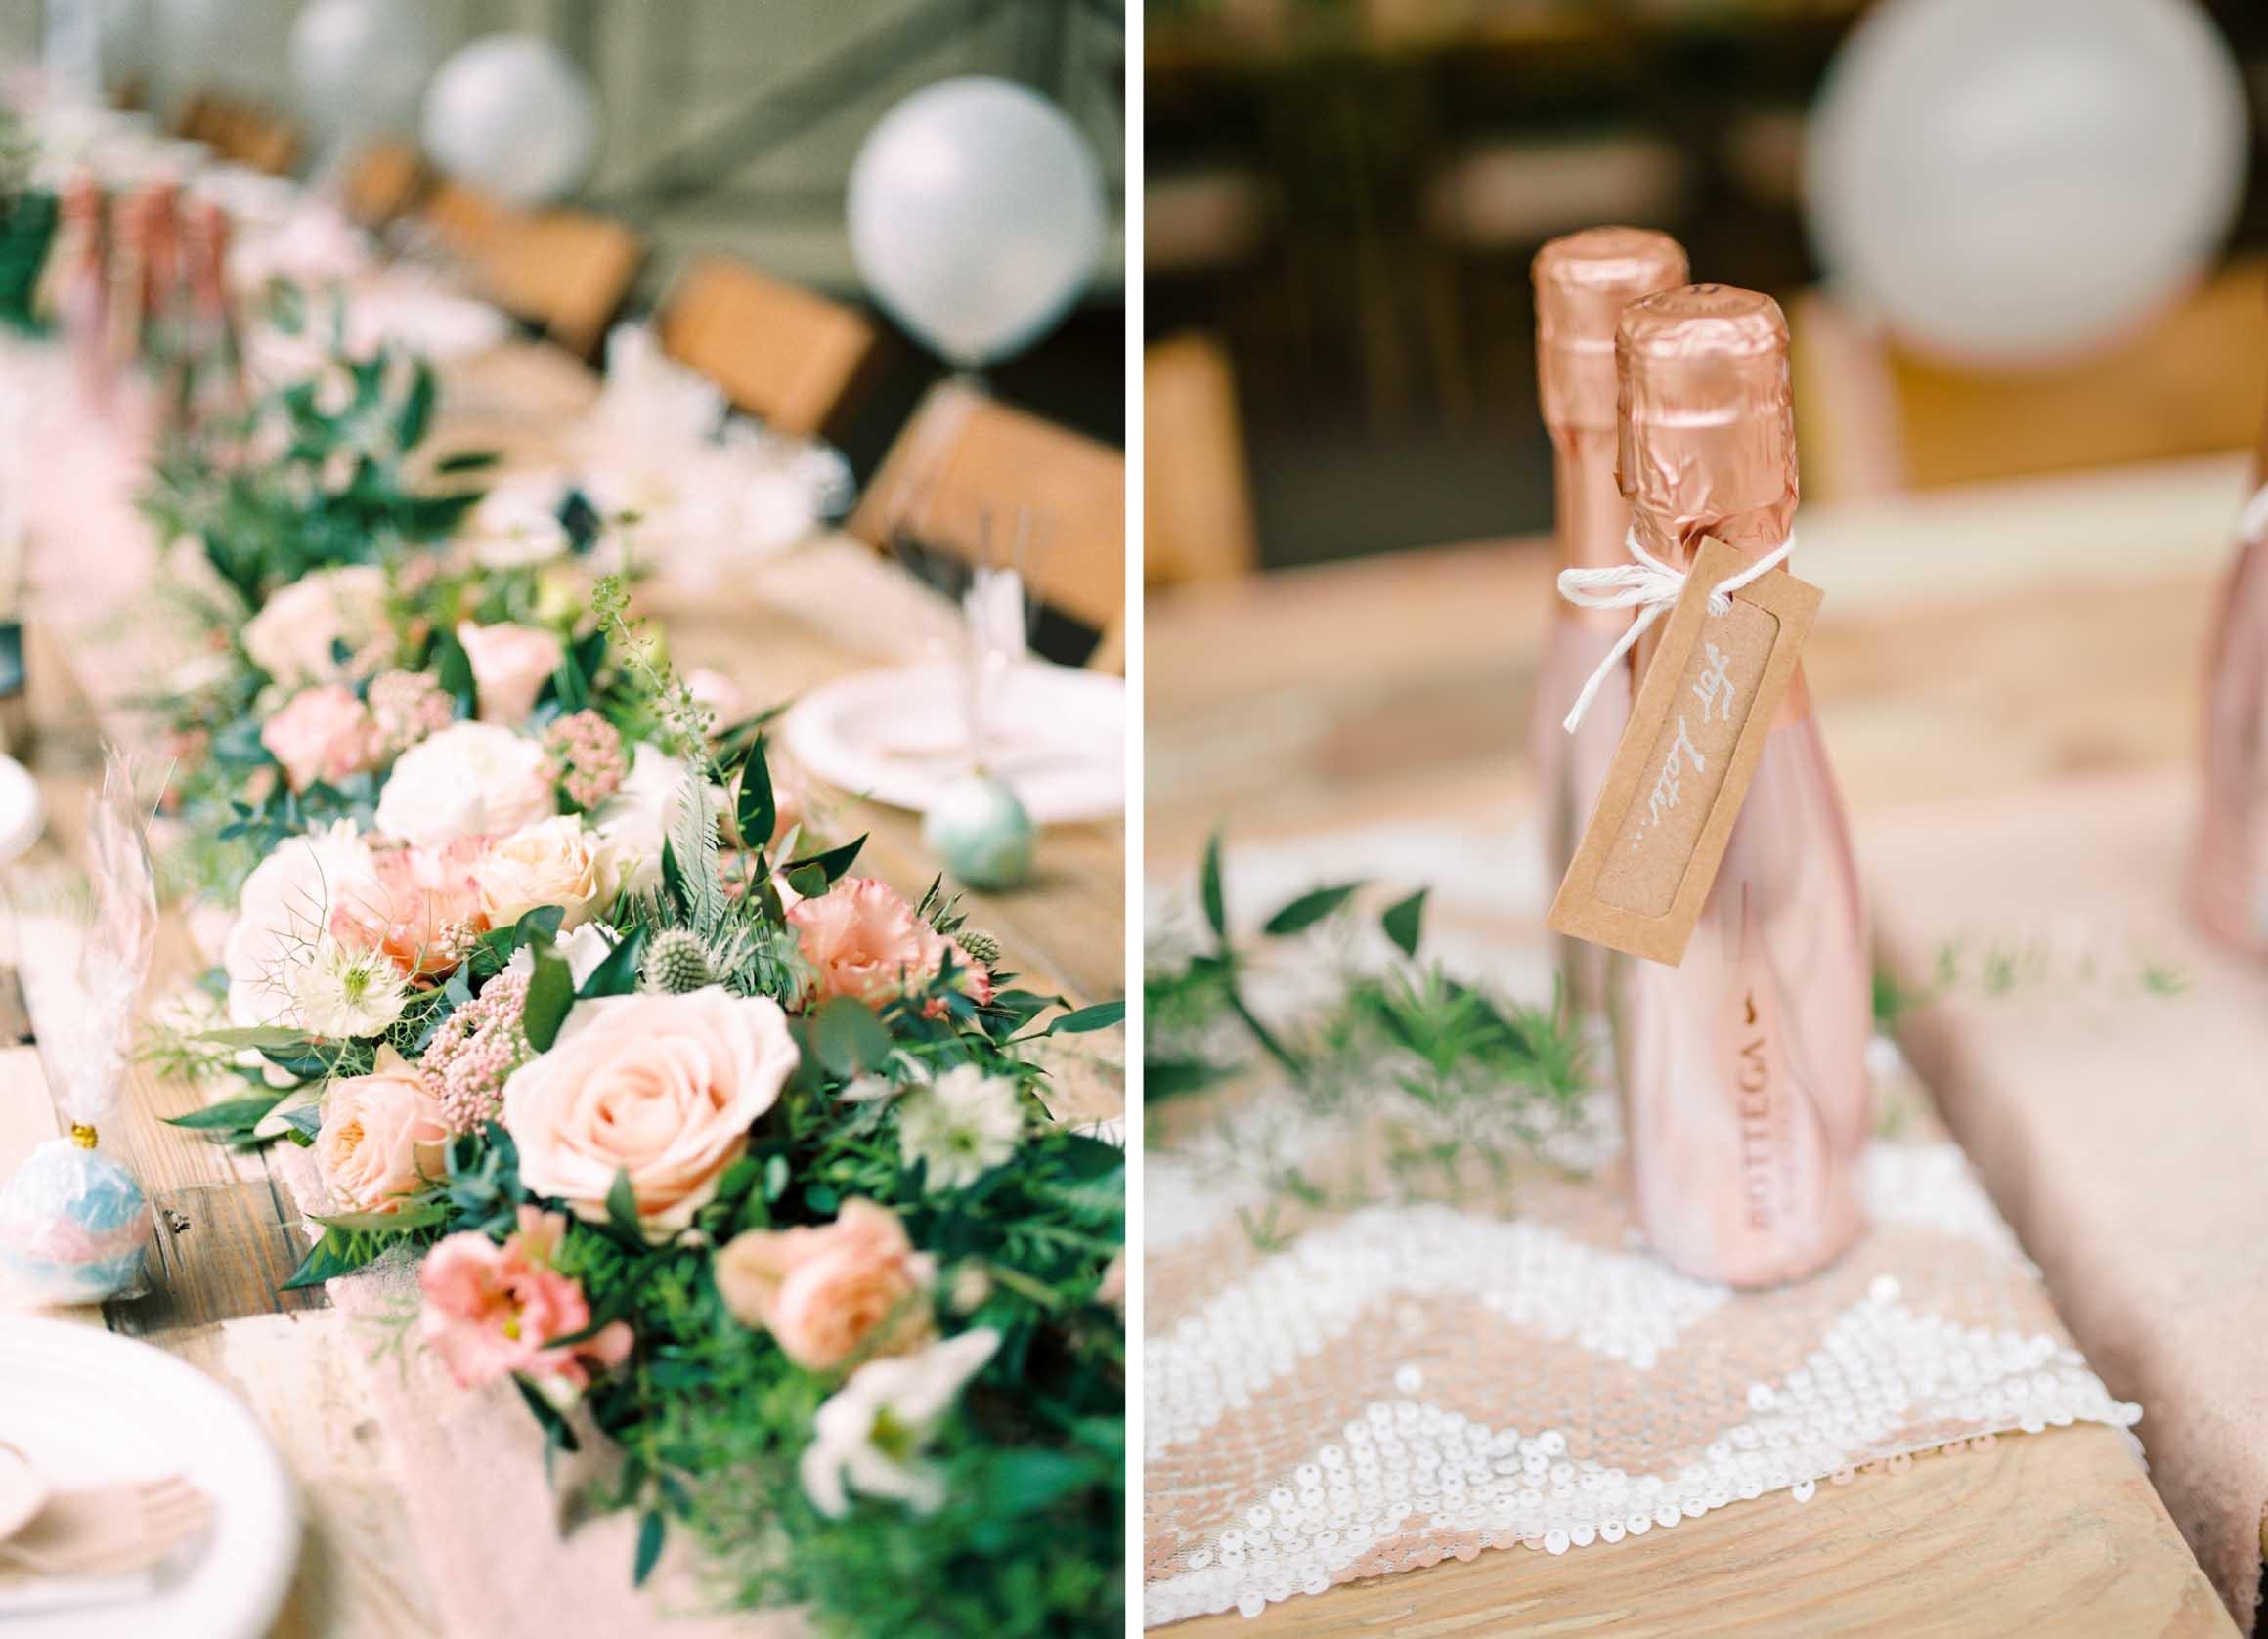 Amy O'Boyle Photography- Destination & UK Fine Art Film Wedding Photographer- London Garden Wedding At Home 6.jpg